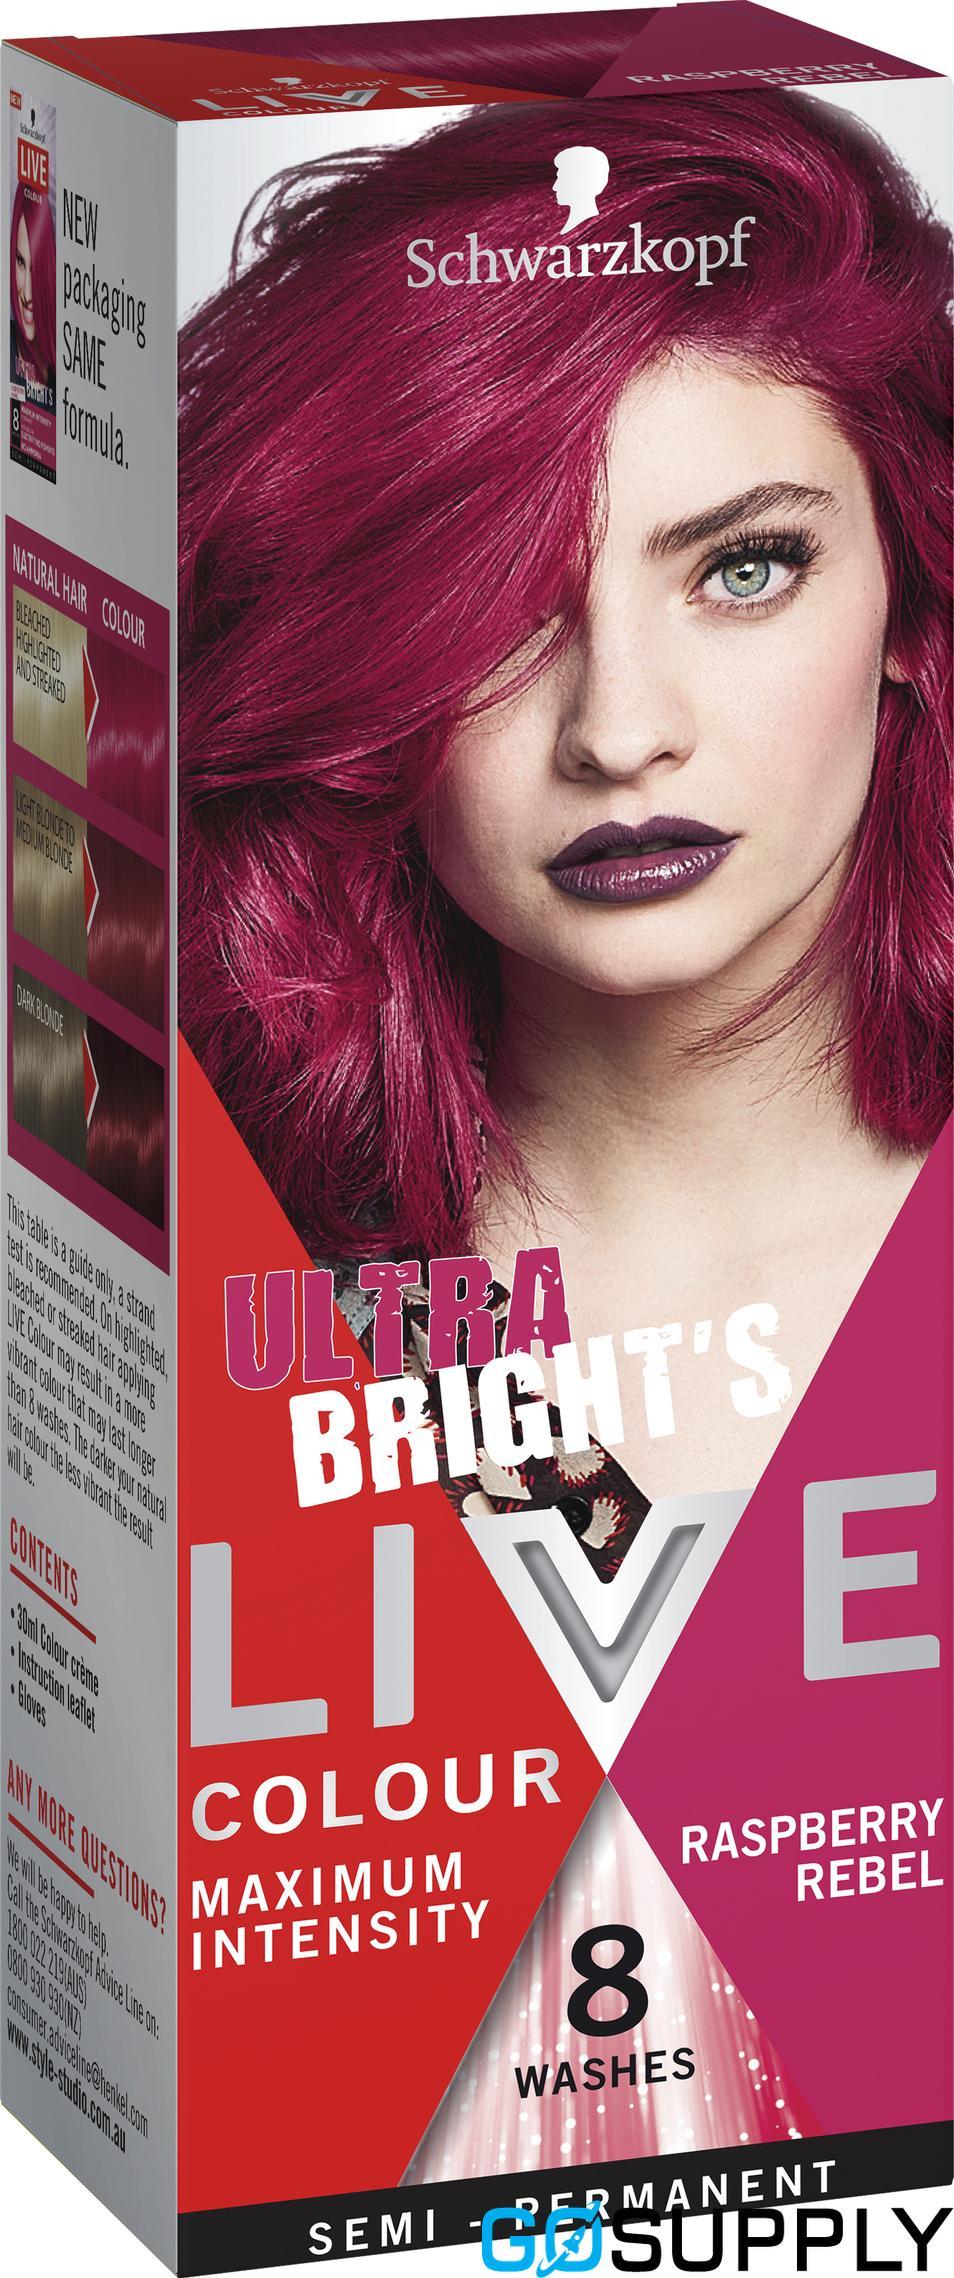 Schwarzkopf Ultra Brights Live Colour Raspberry Rebel